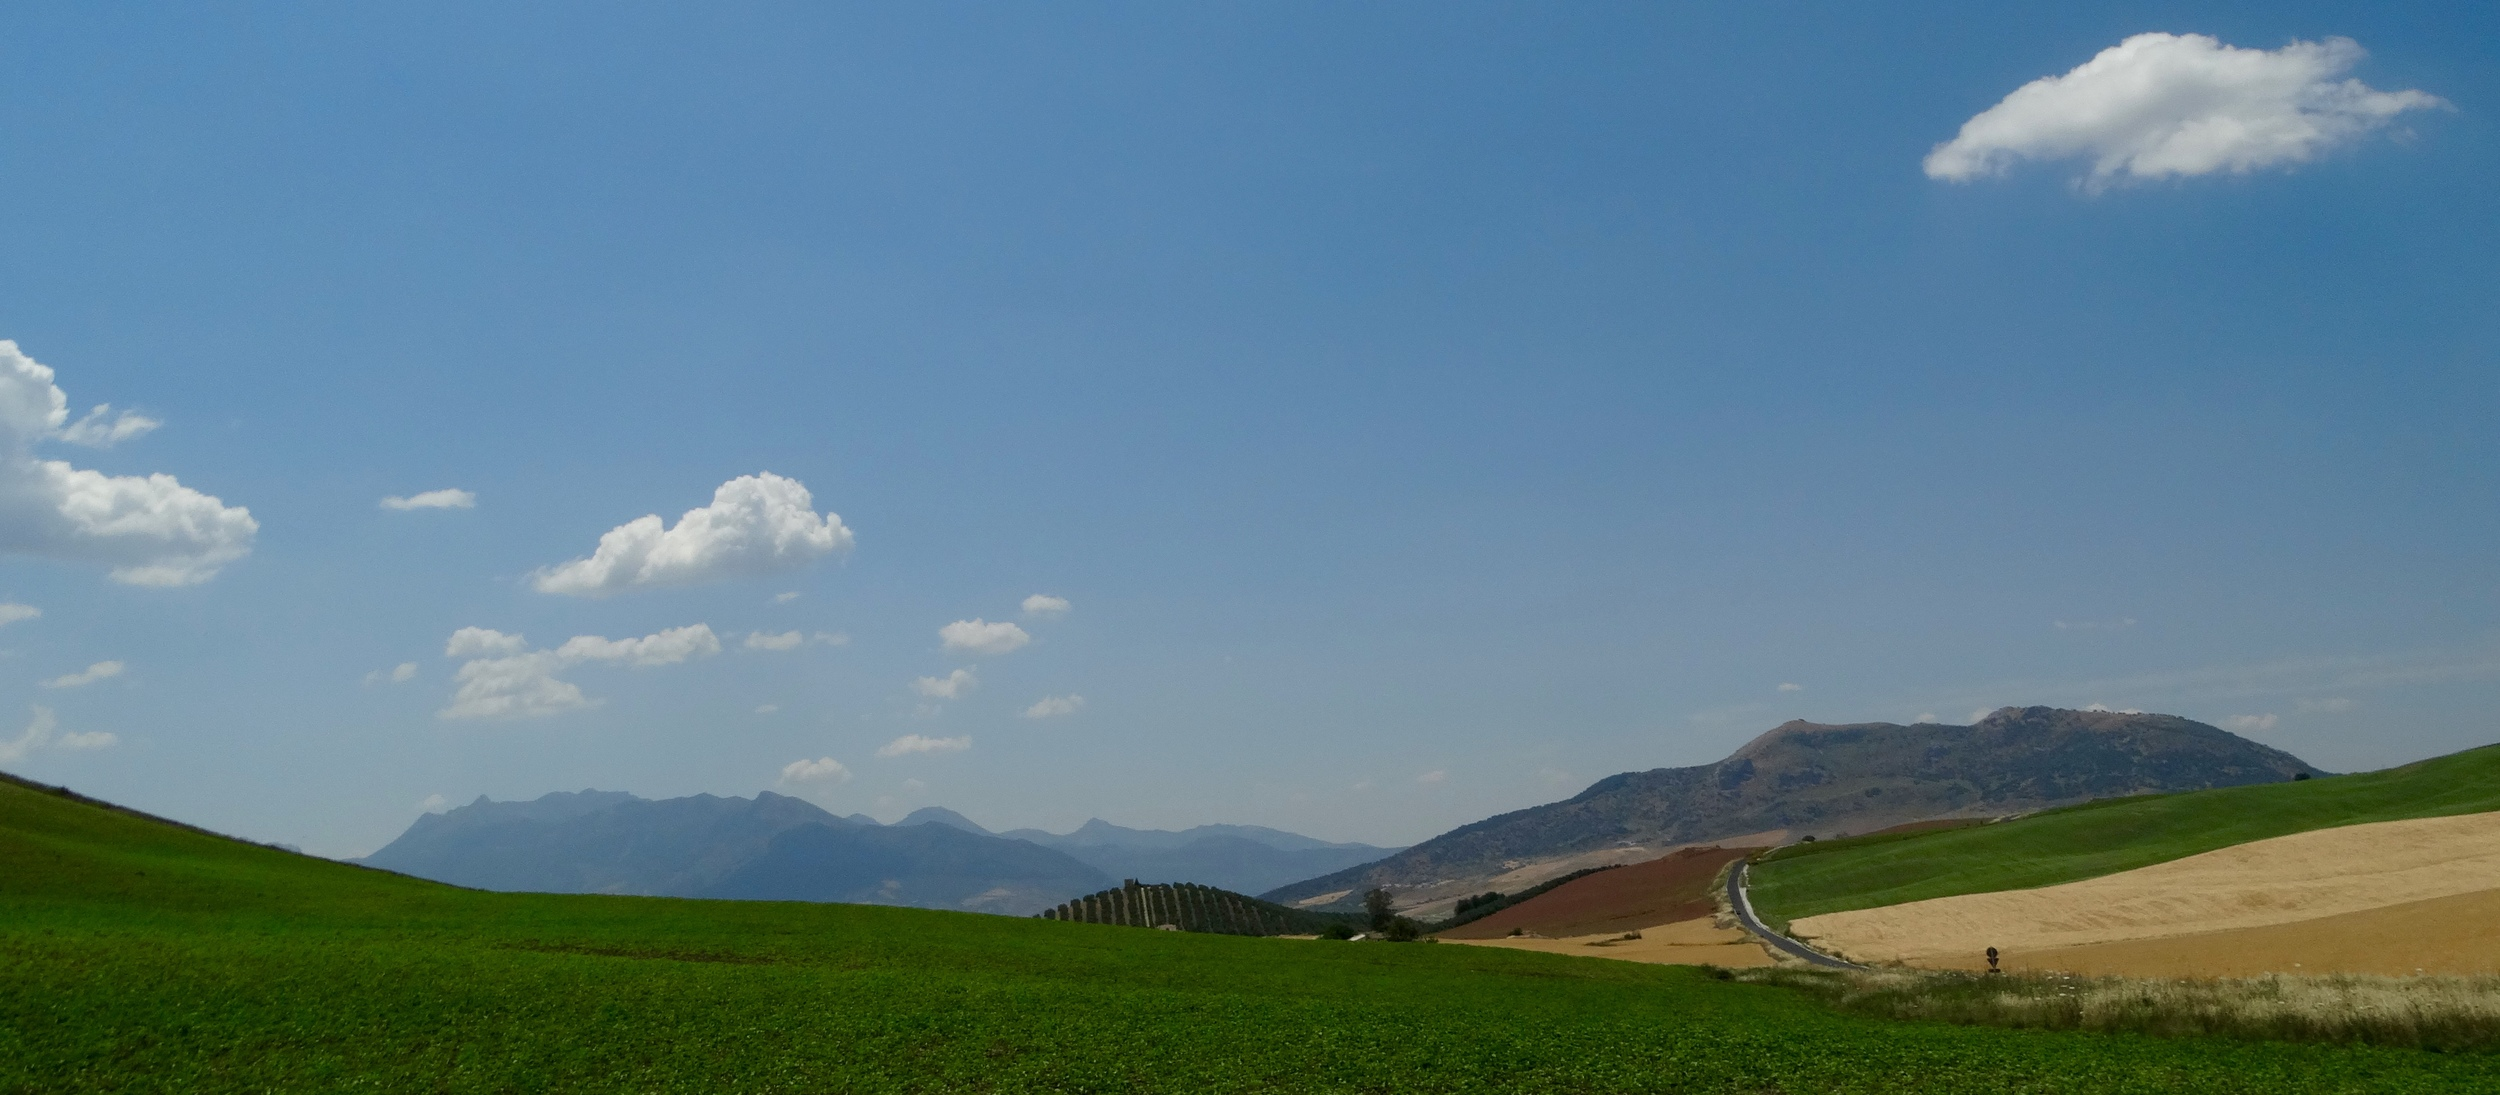 Lands north of Ronda